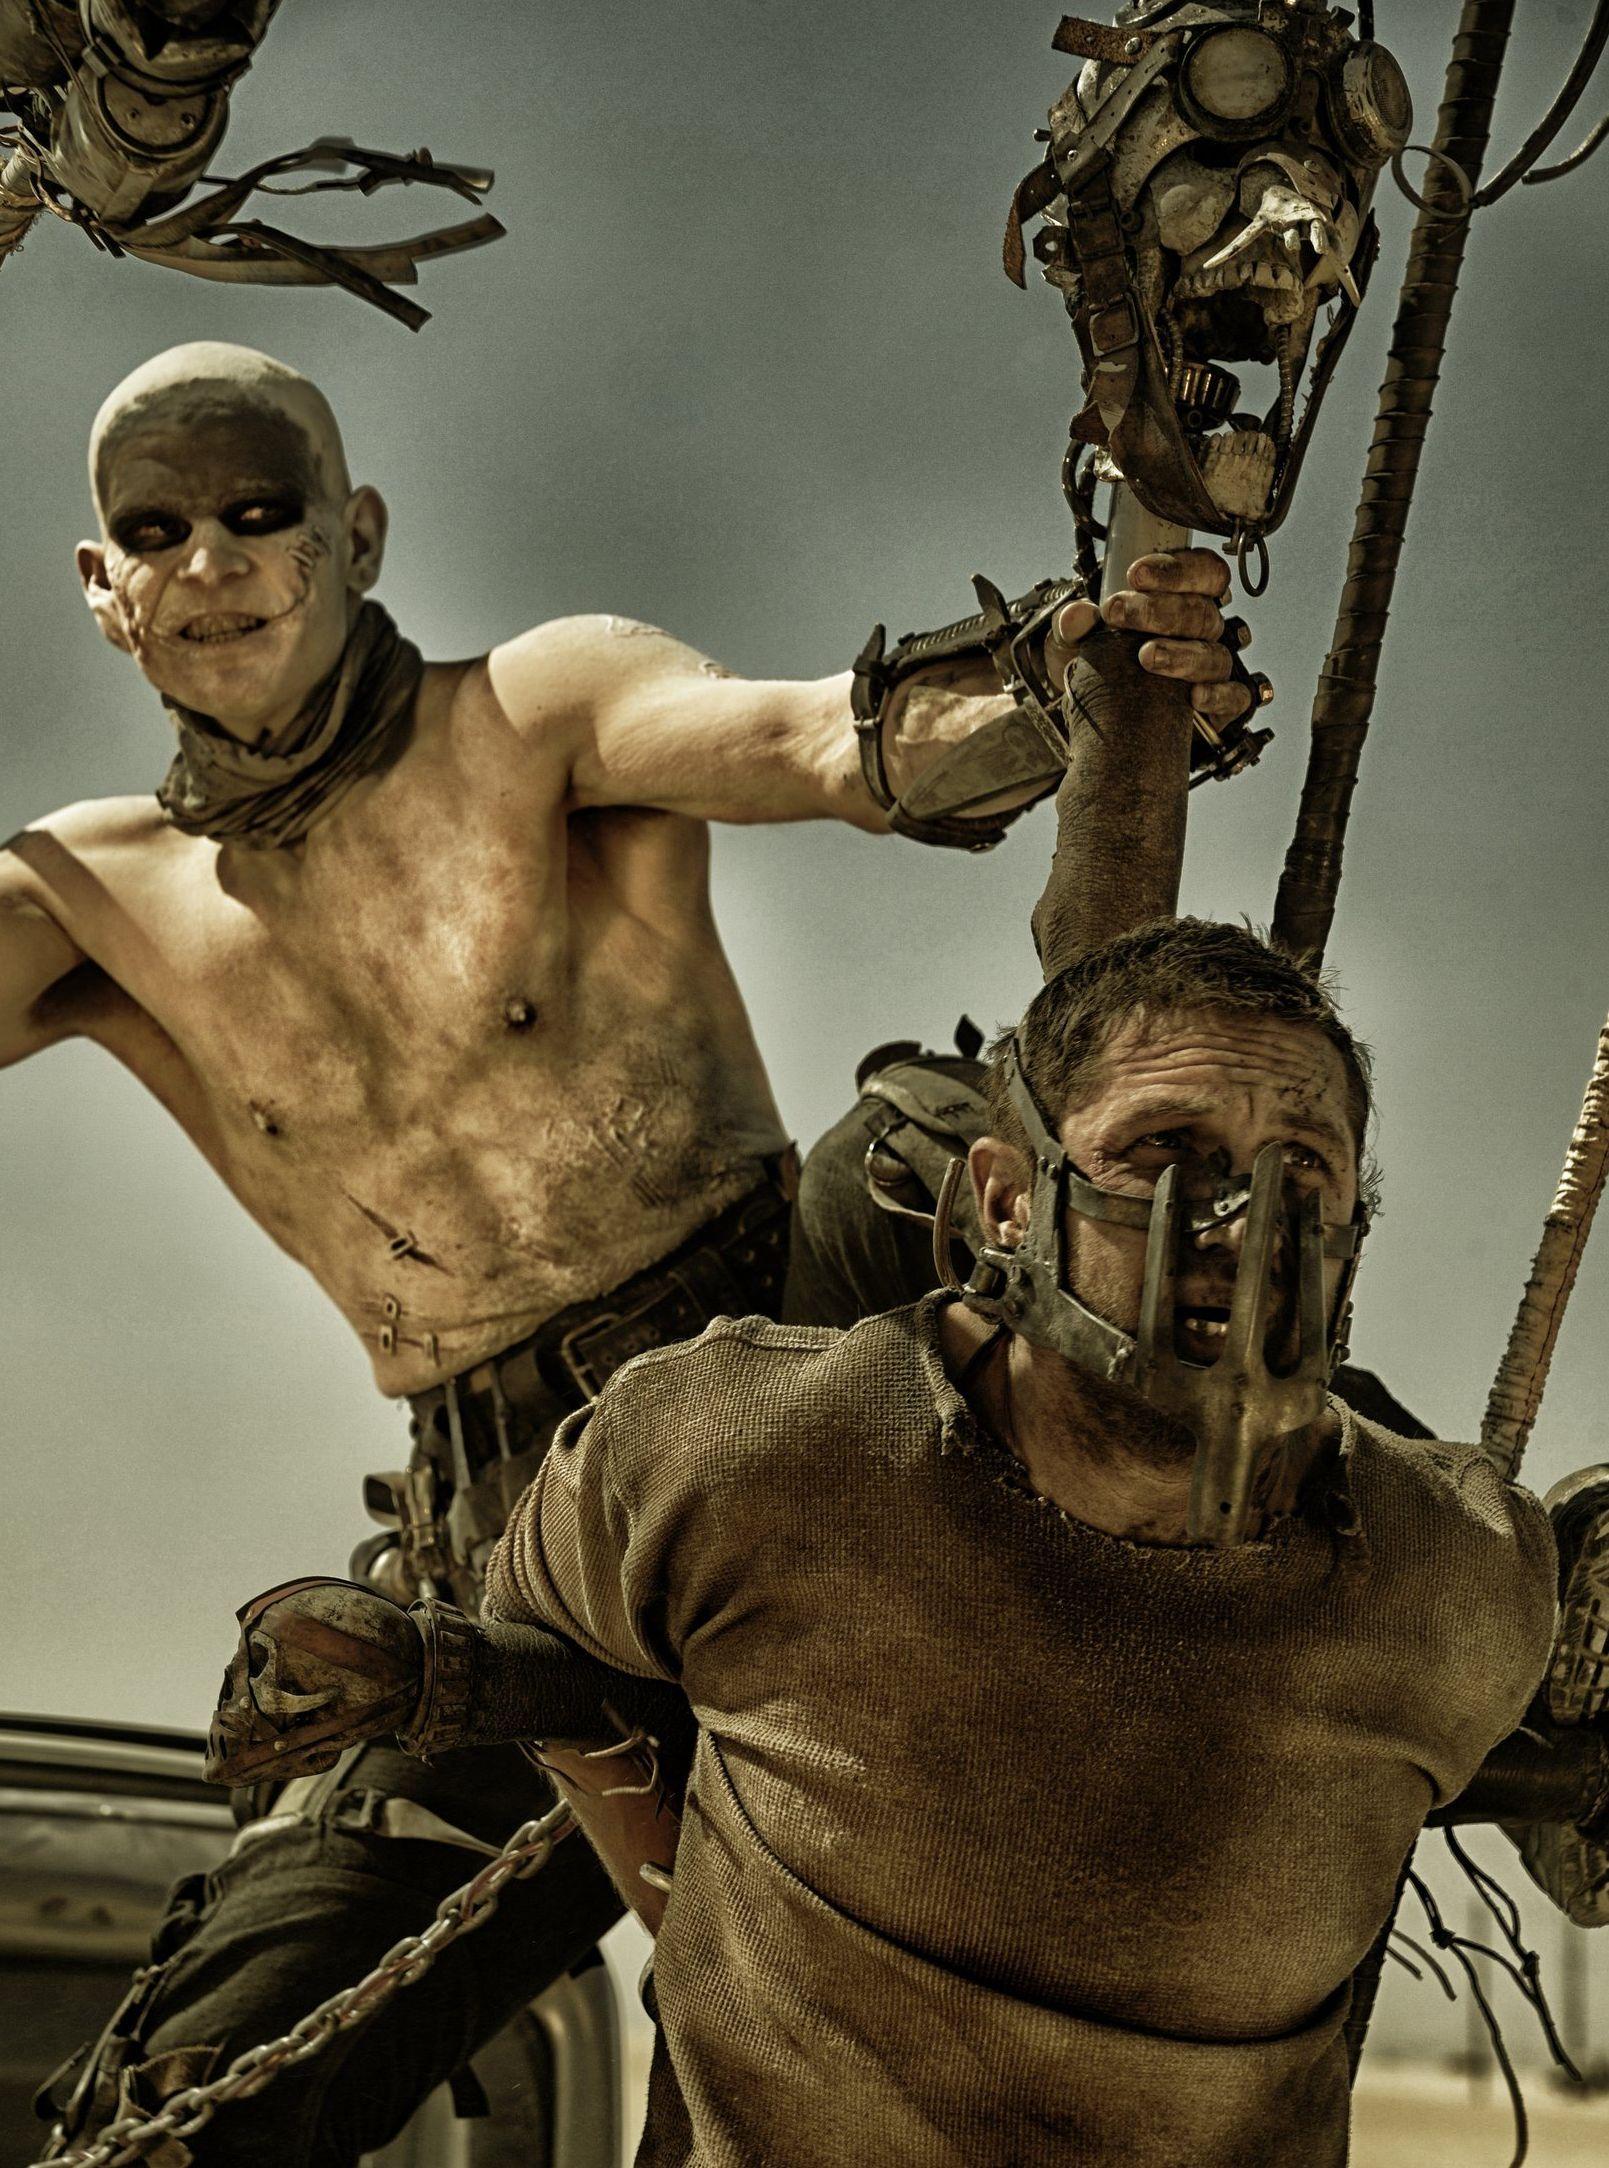 Masked Max Rockatansky Tom Hardy in Mad Max: Fury Road